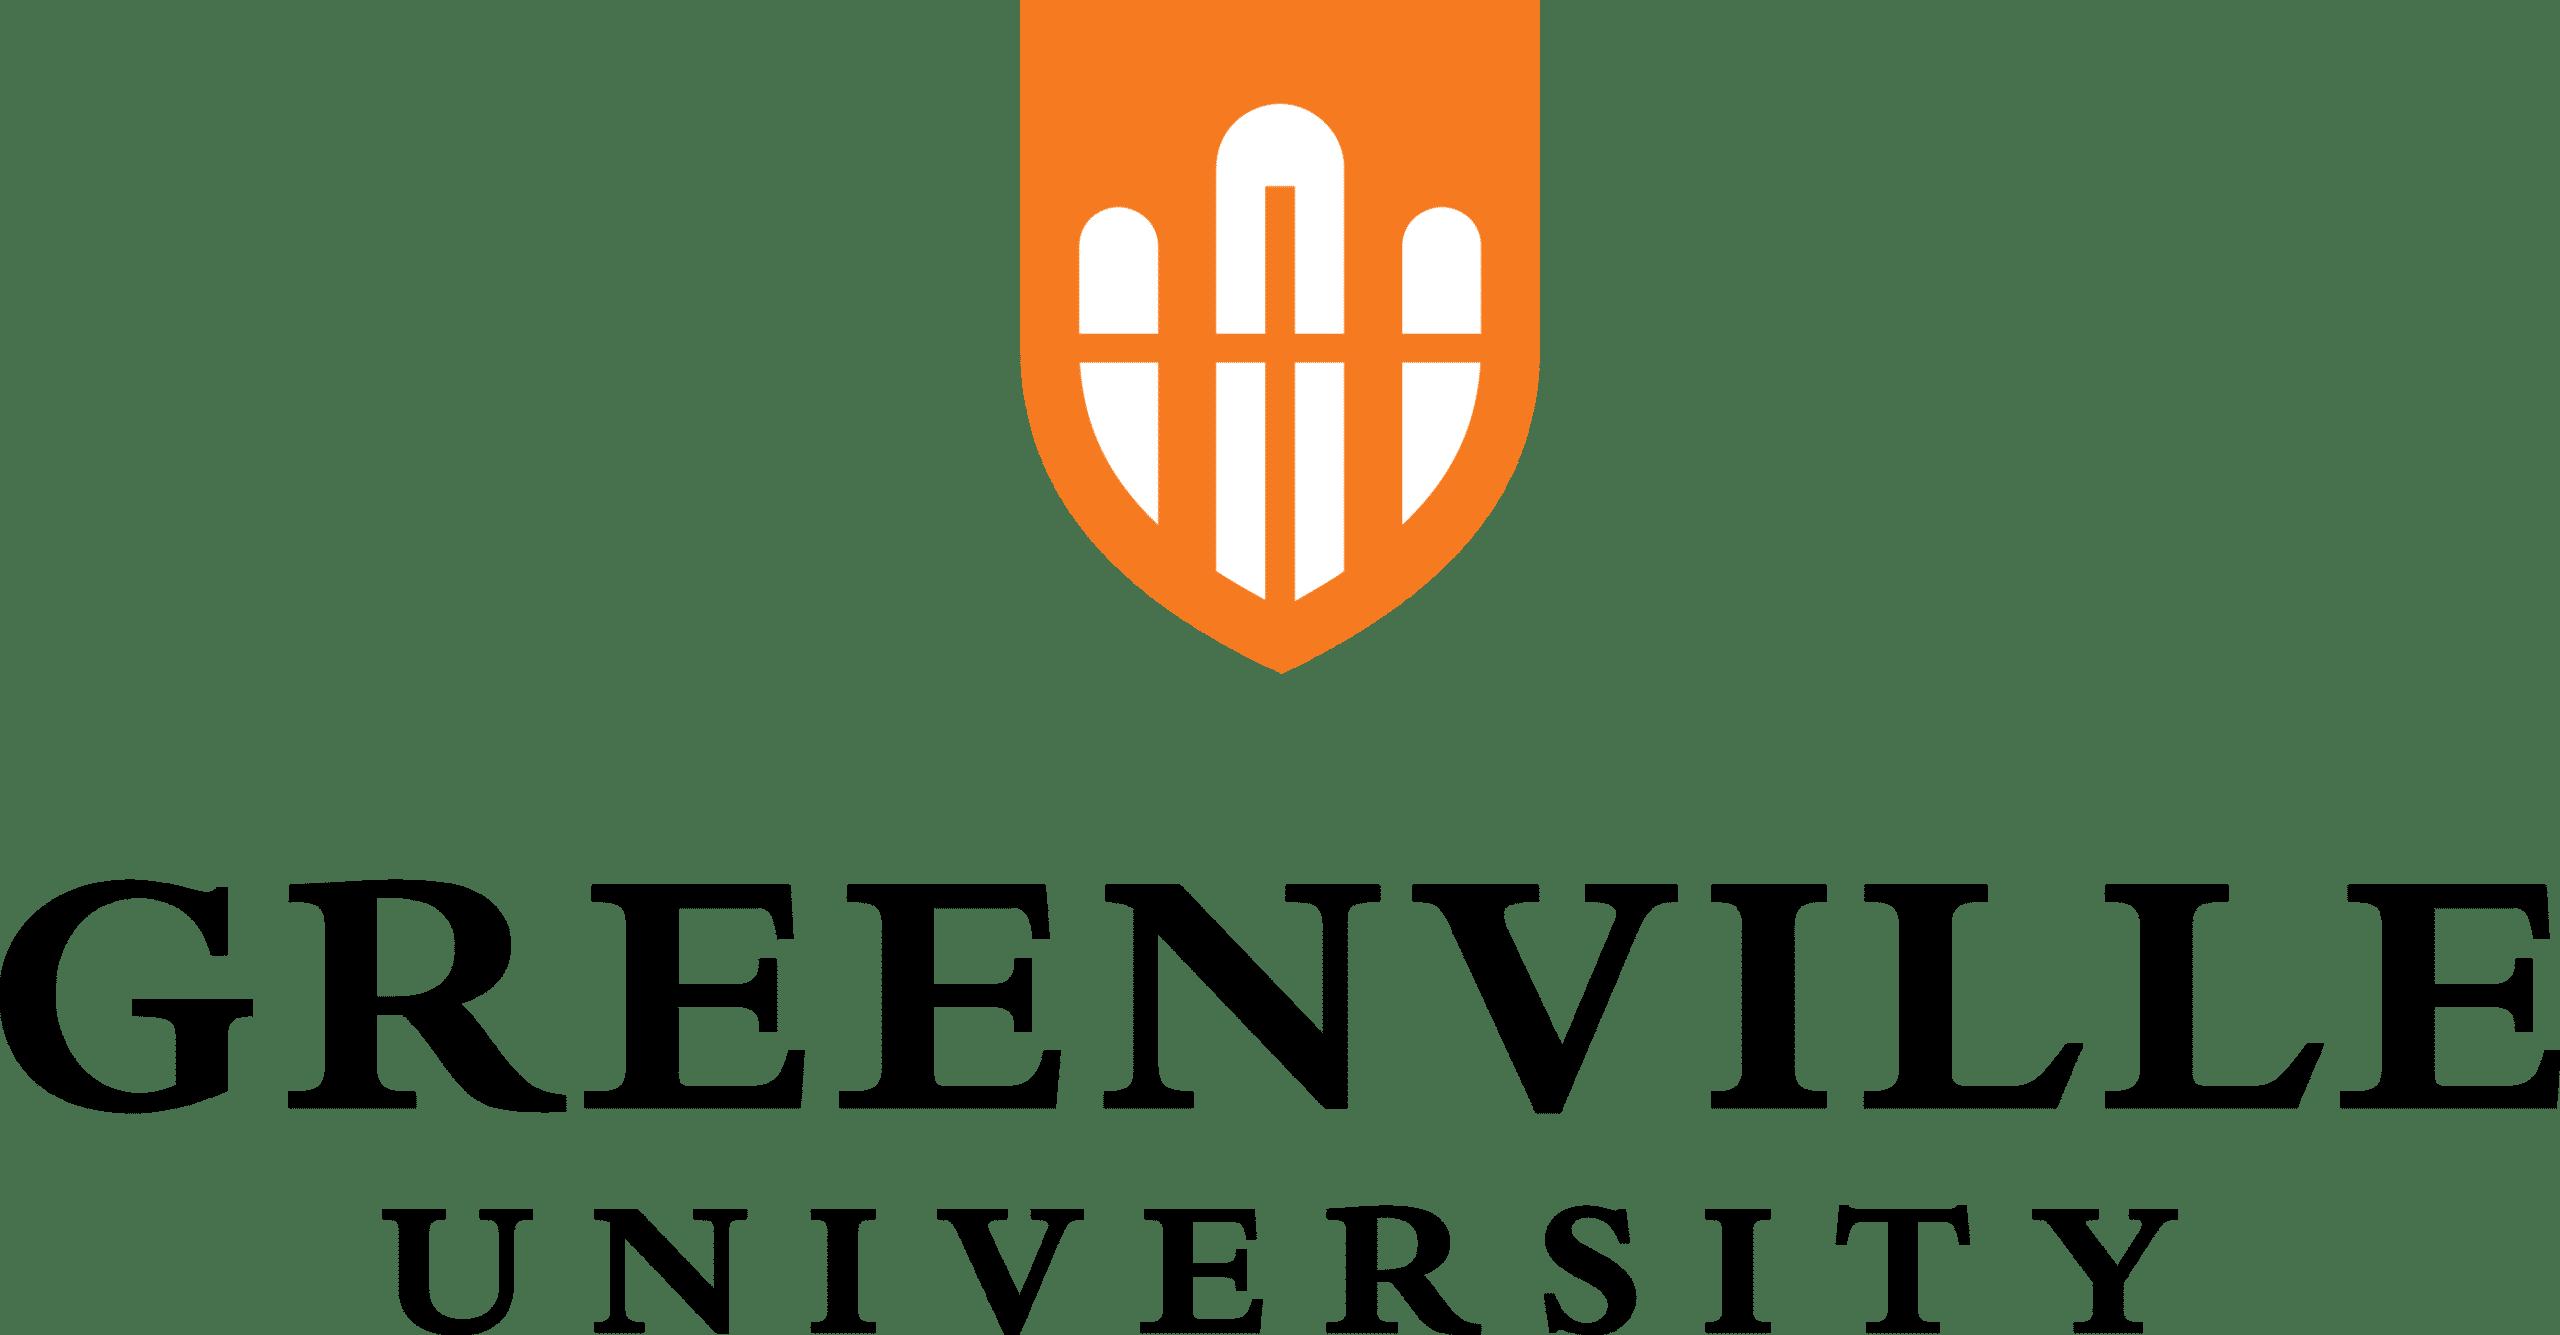 Greenville University logo scaled